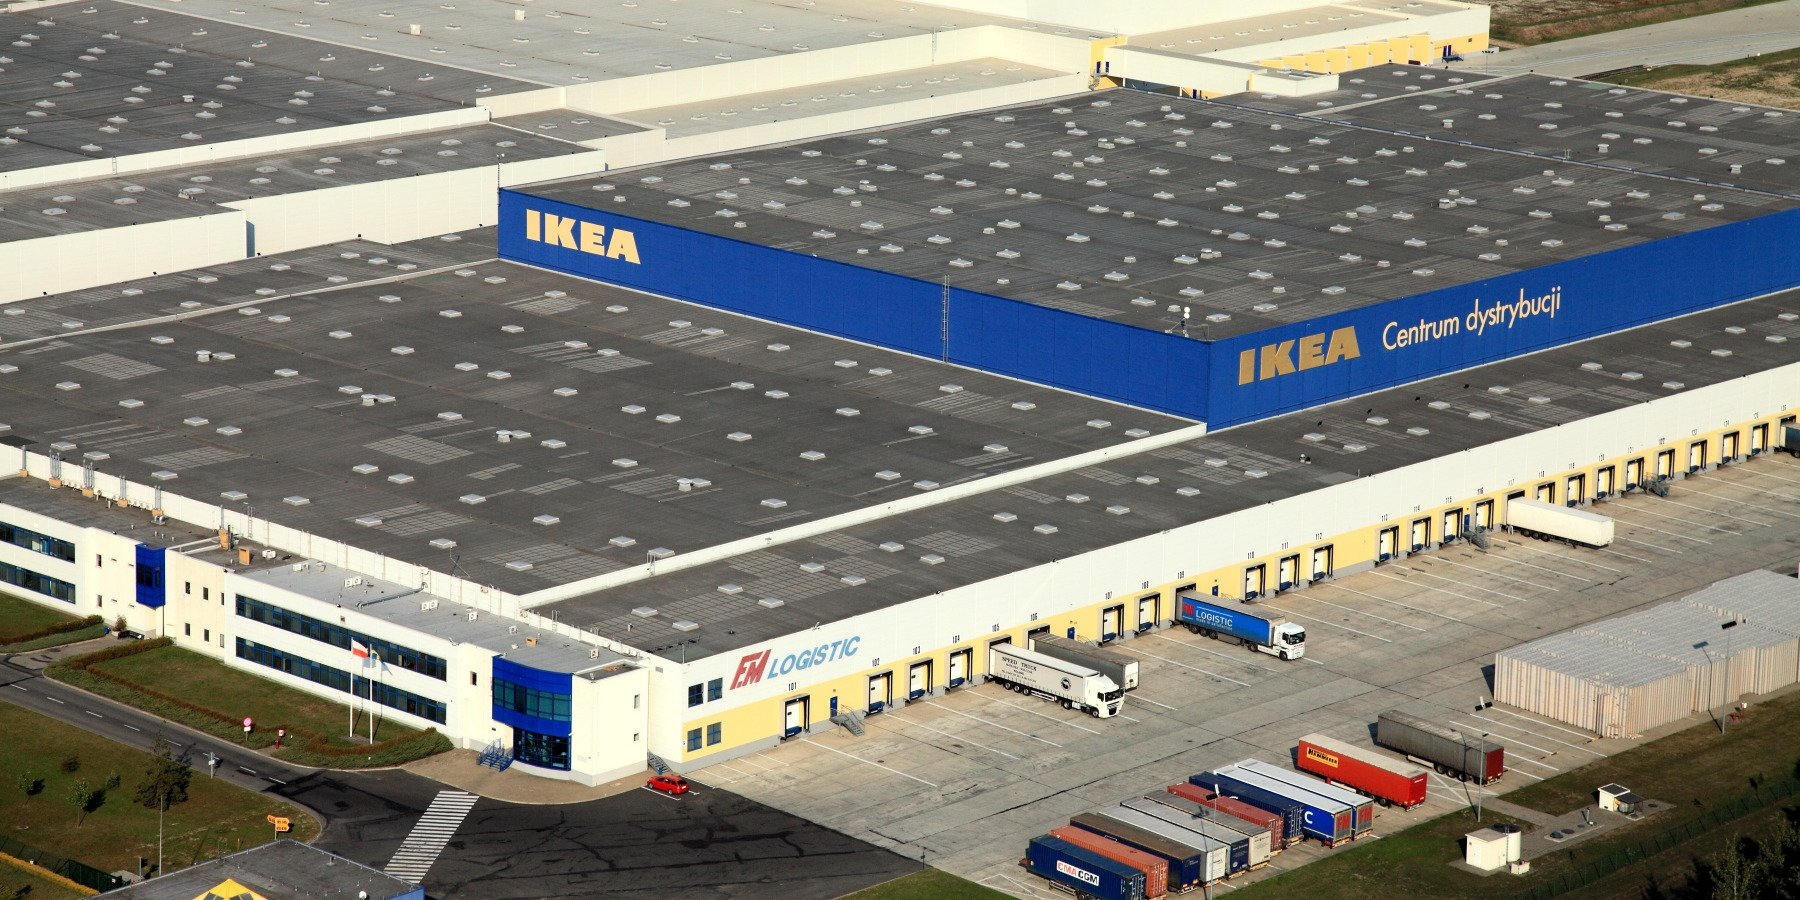 Centrum Dystrybucji IKEA ma już 20 lat